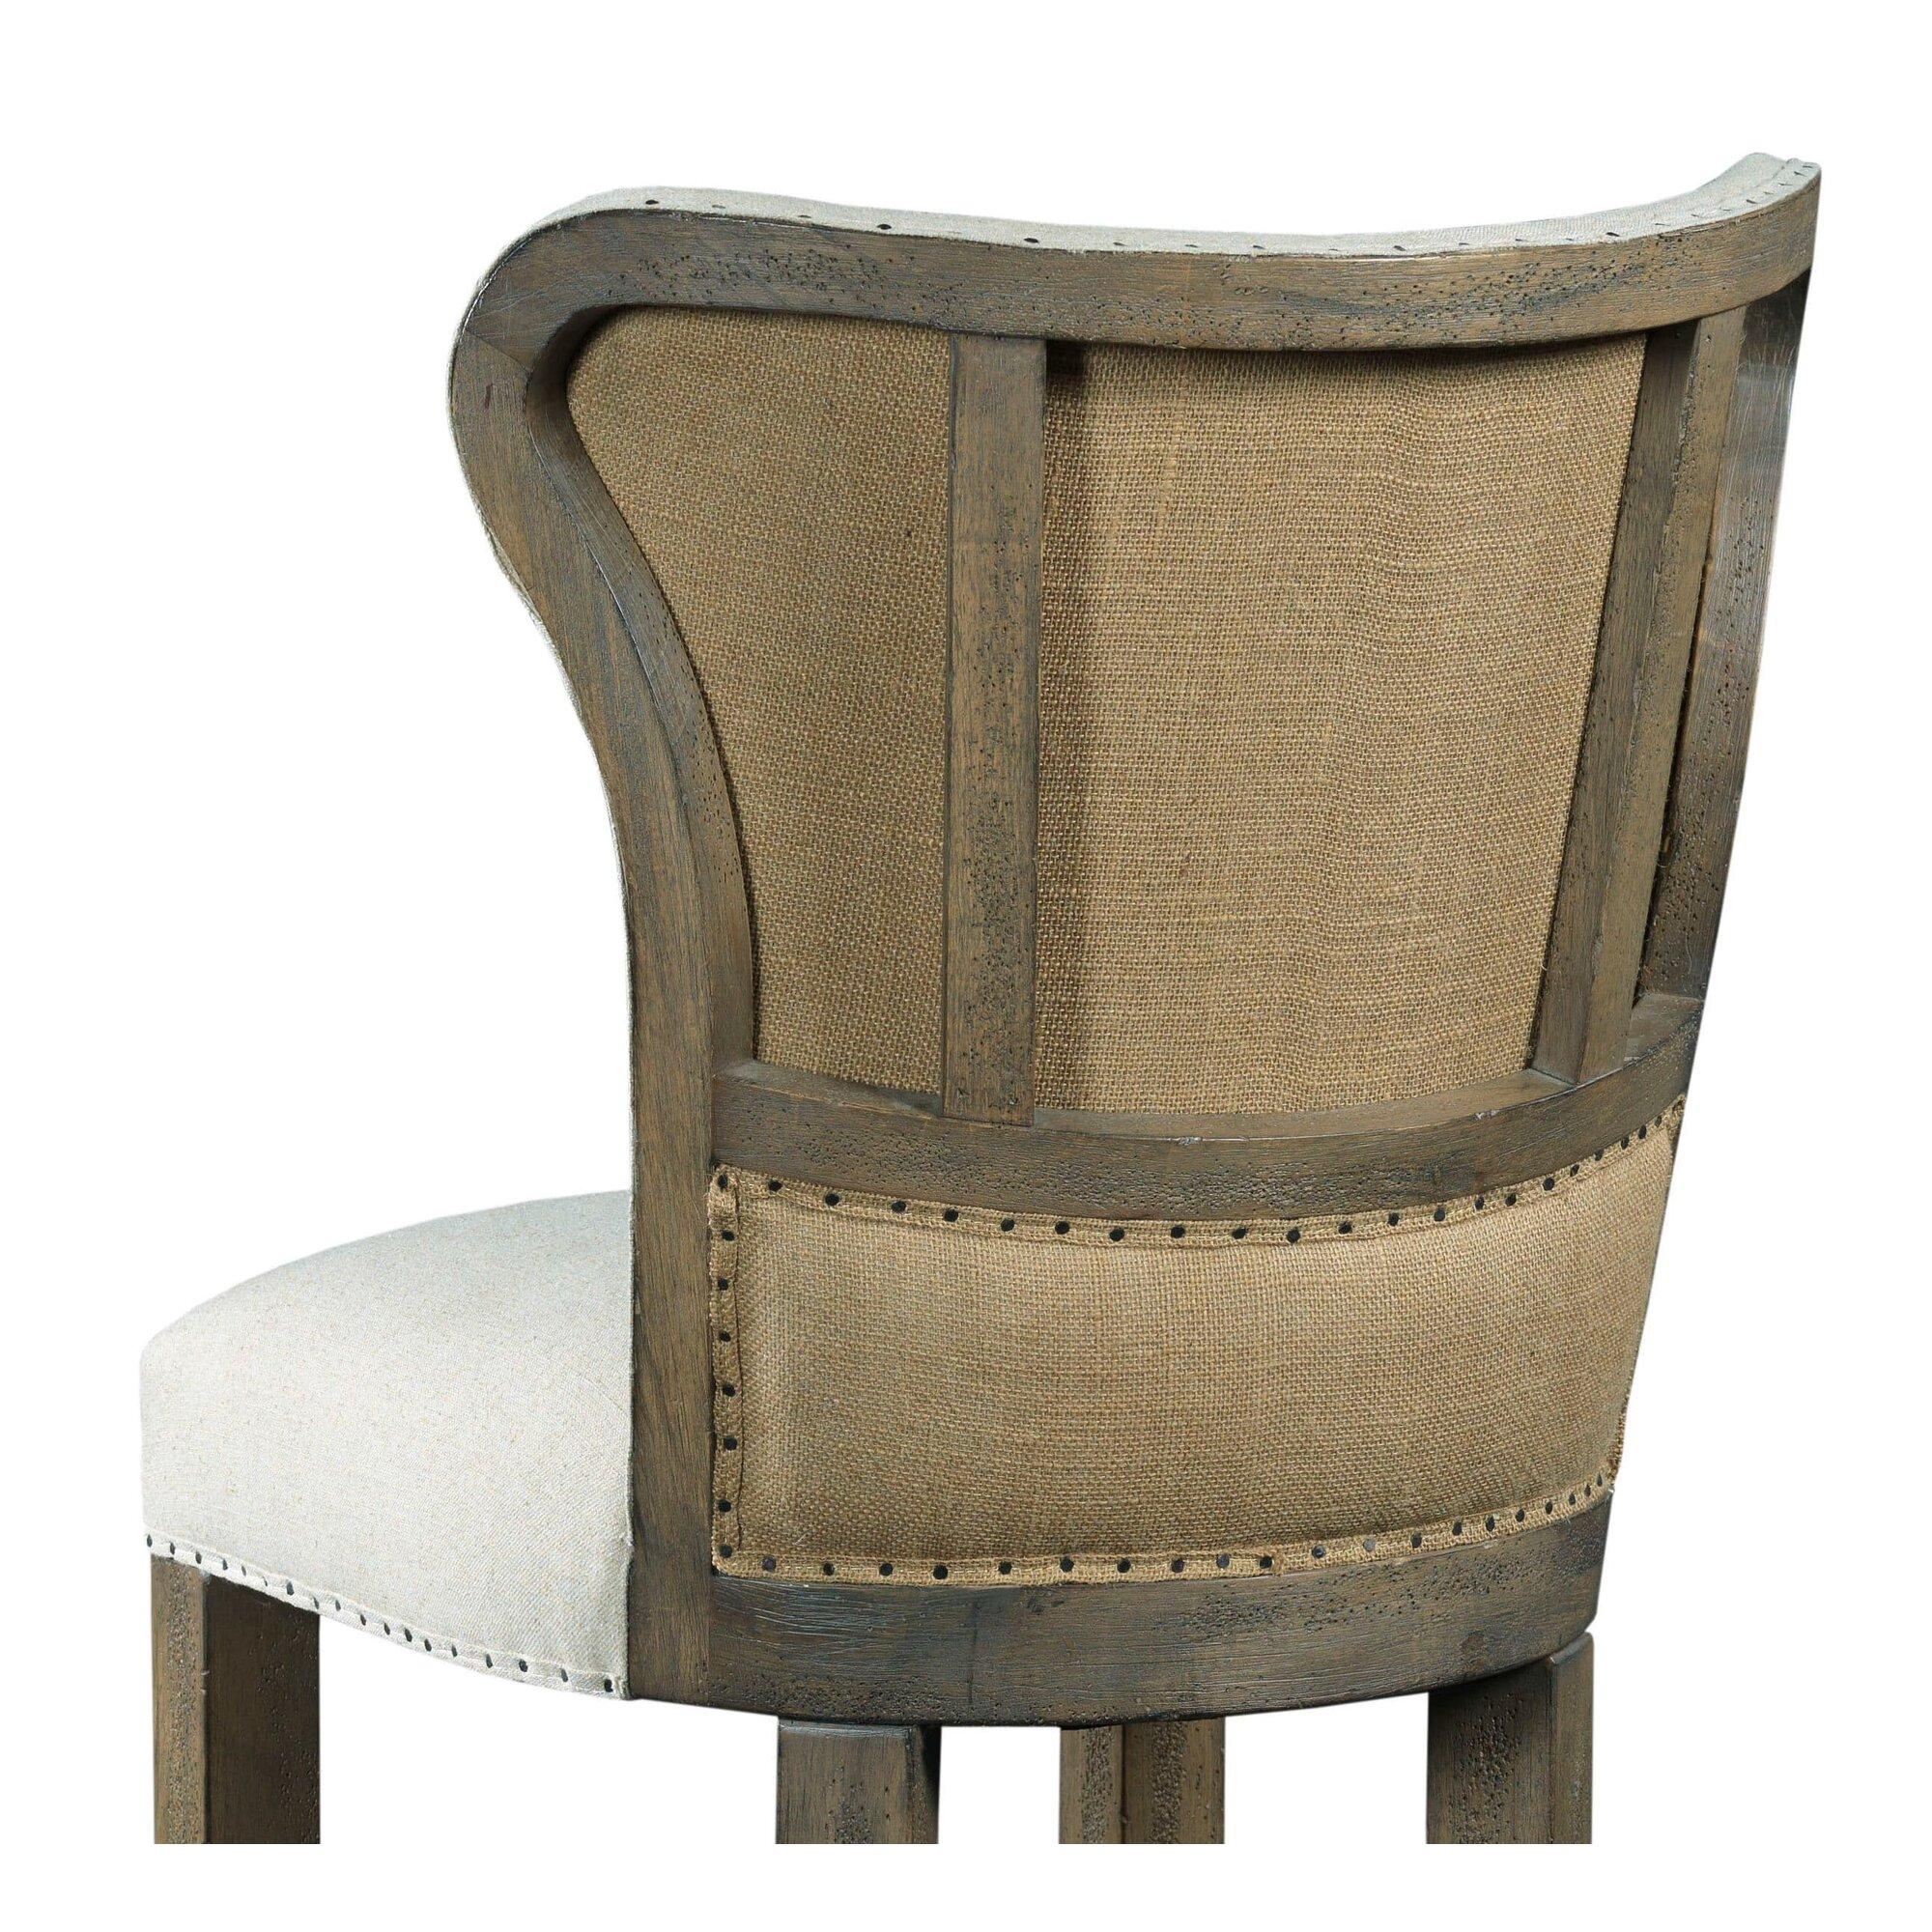 Hooker Furniture 24quot Bar Stool amp Reviews Wayfair : 2422BarStool from www.wayfair.com size 2000 x 2000 jpeg 720kB